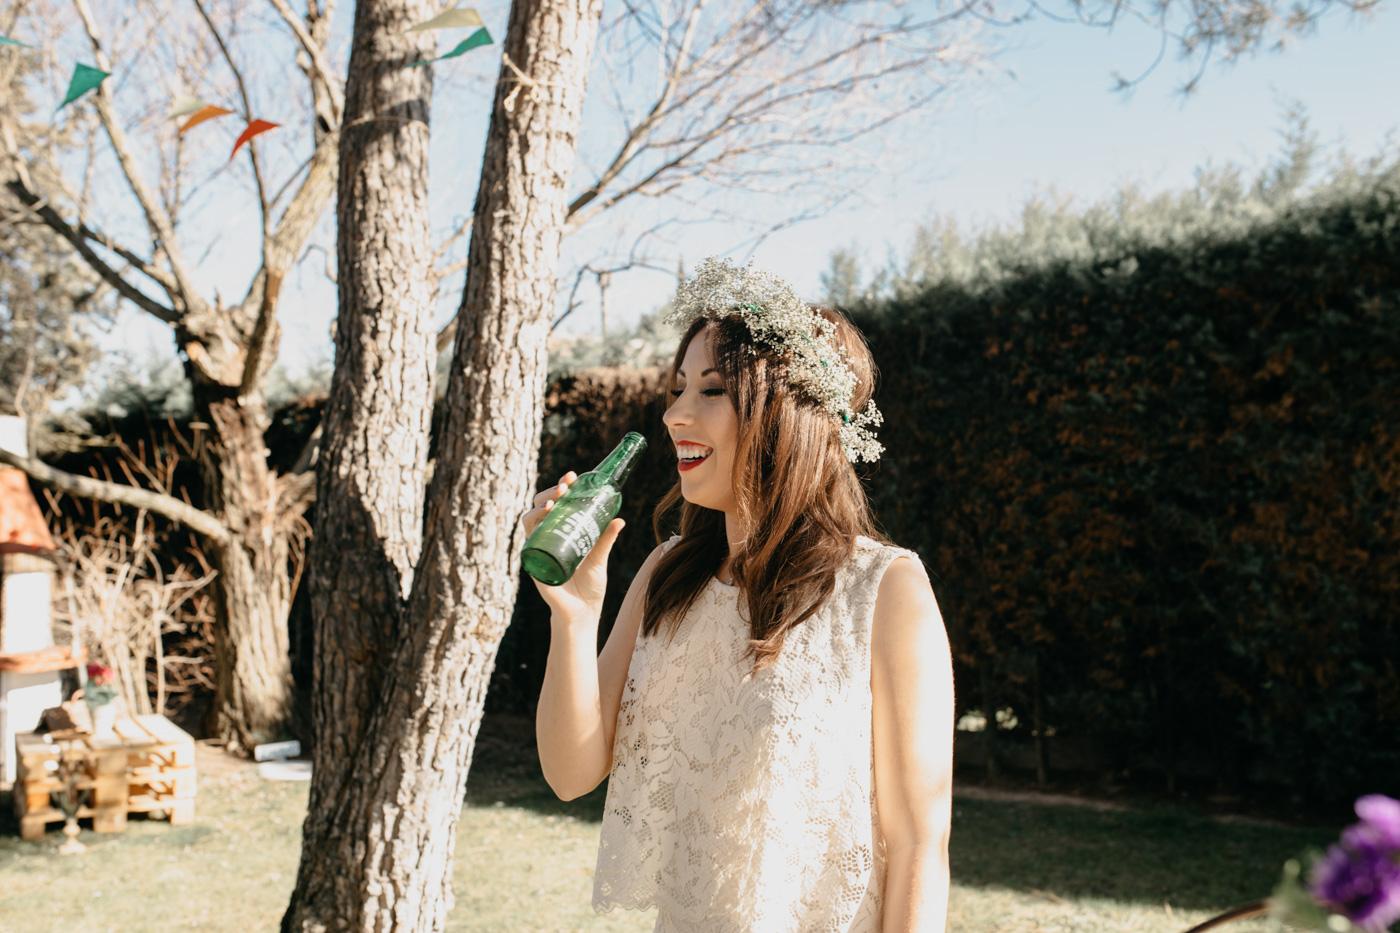 Velvet-Hush-fotografos-boda-al-aire-libre-madrid-054